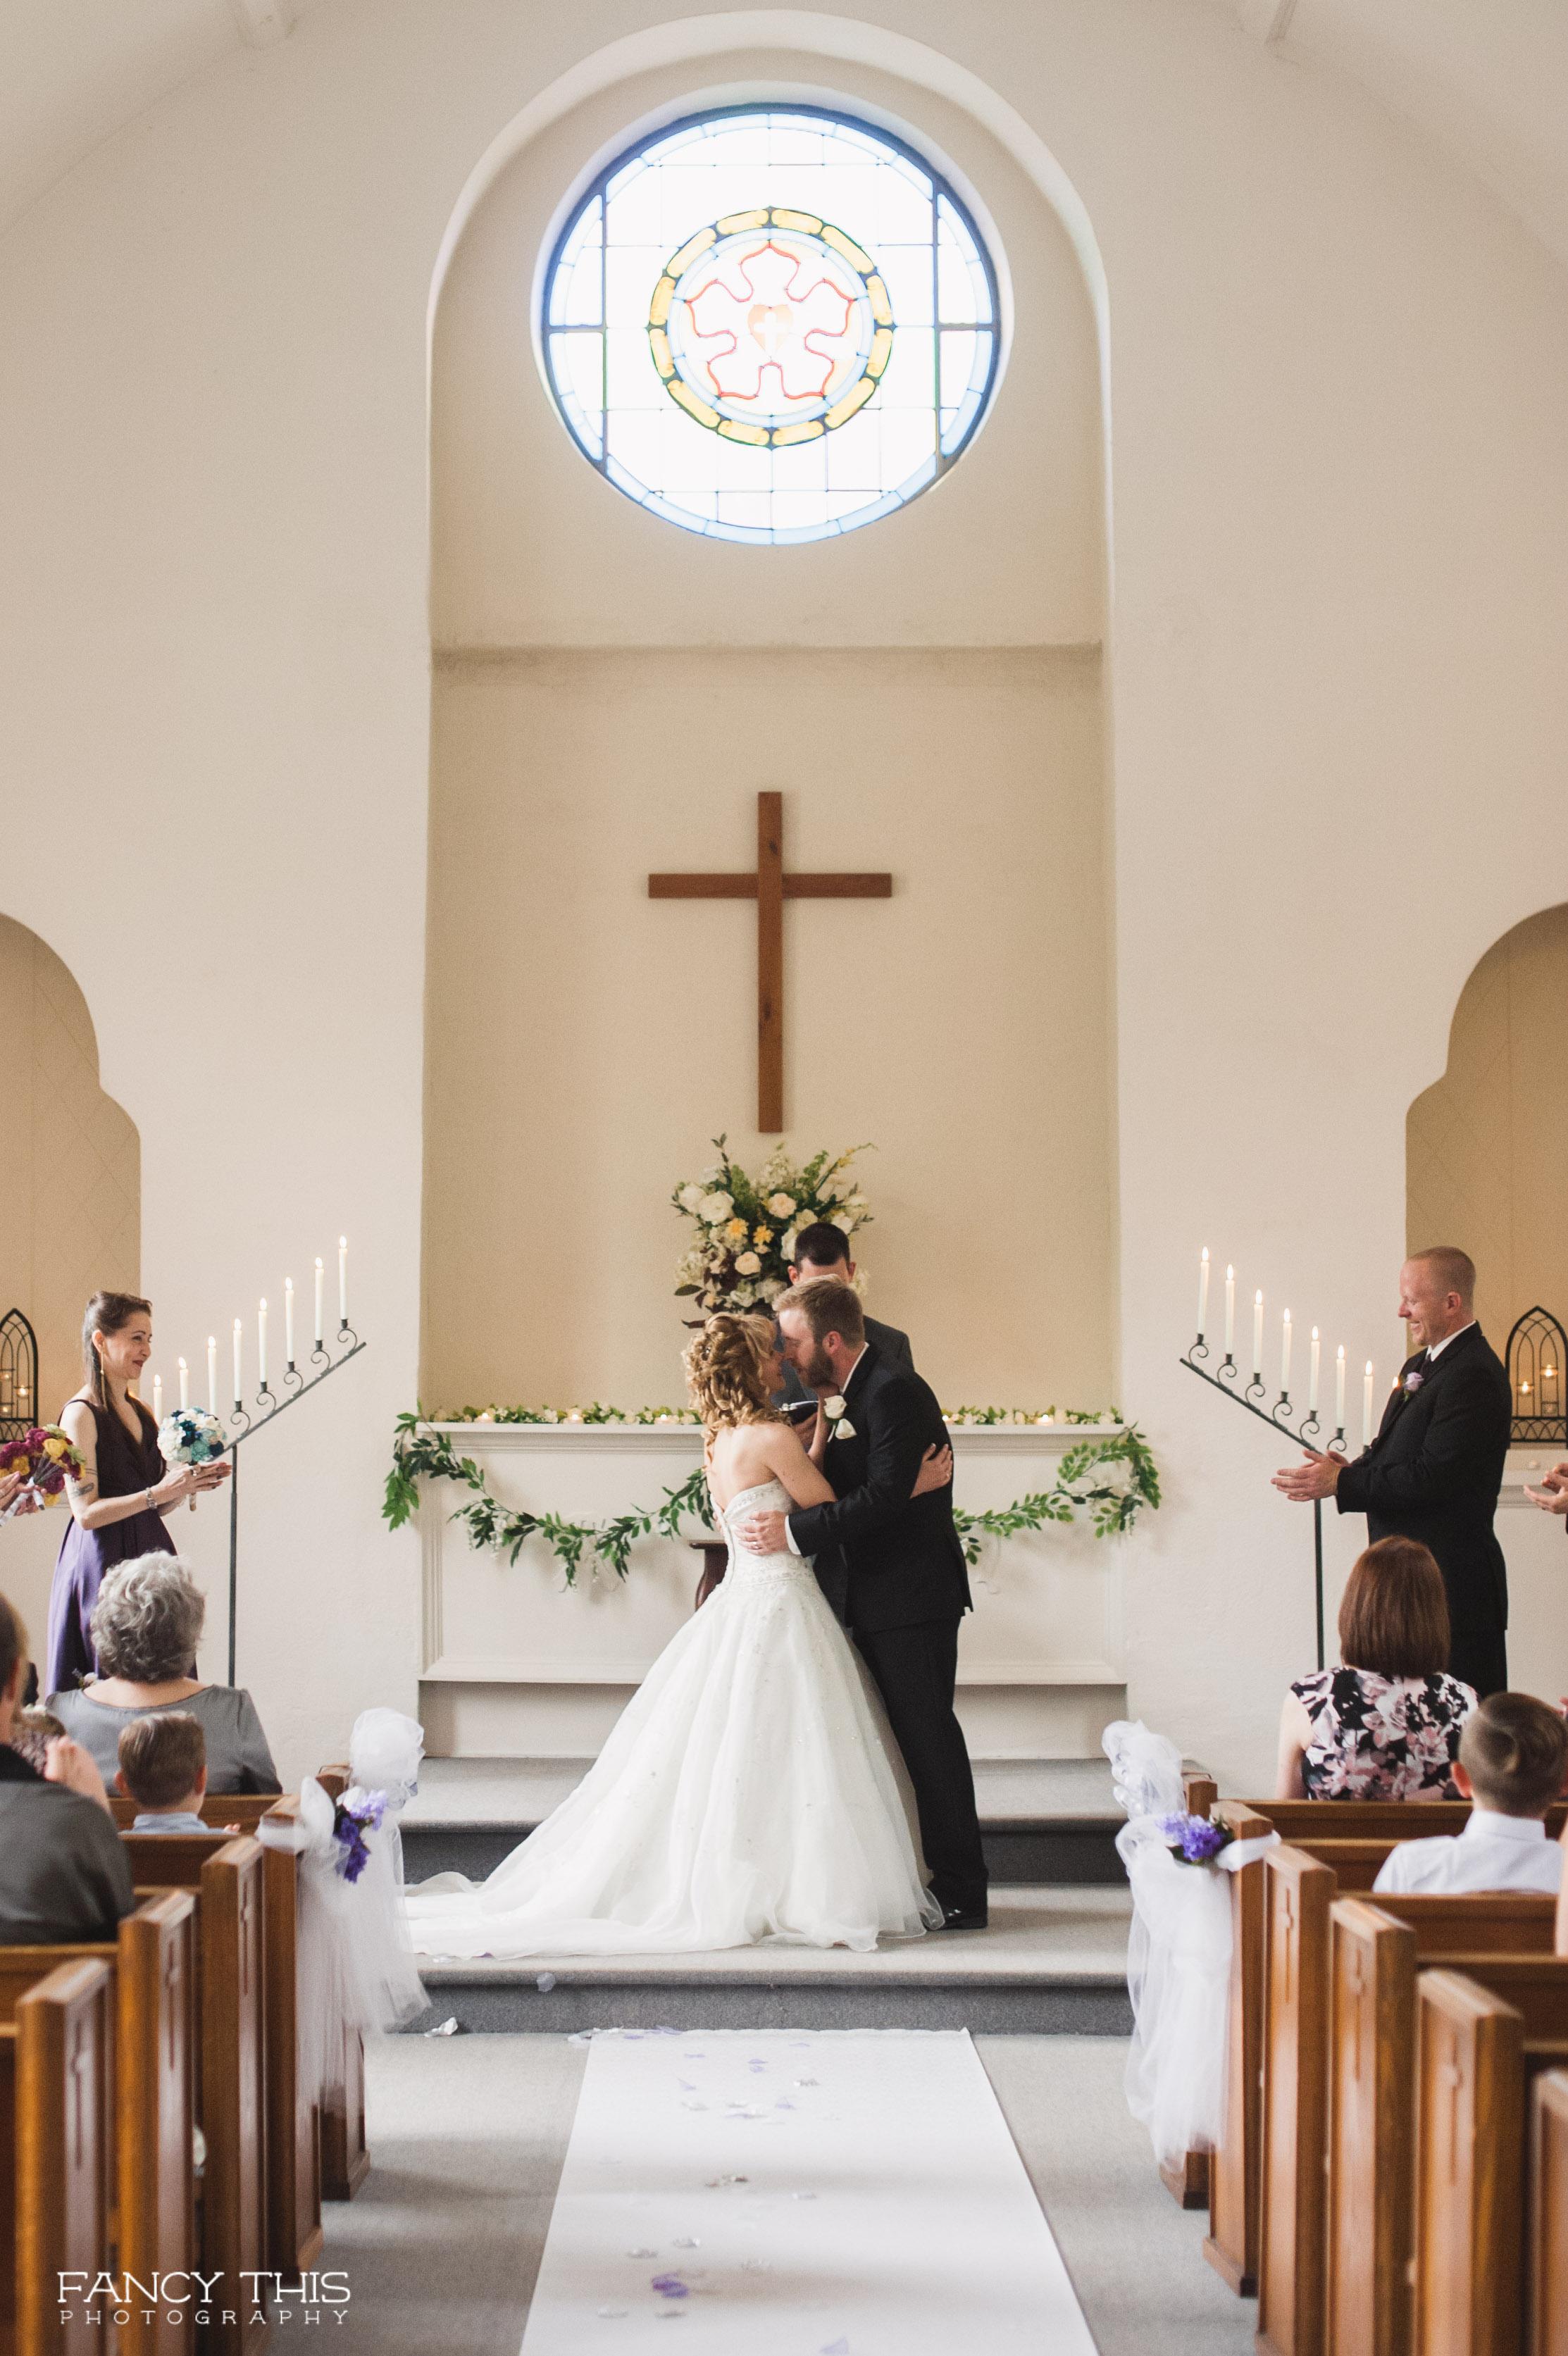 courtneyjasonwedding_socialmediaready117.jpg